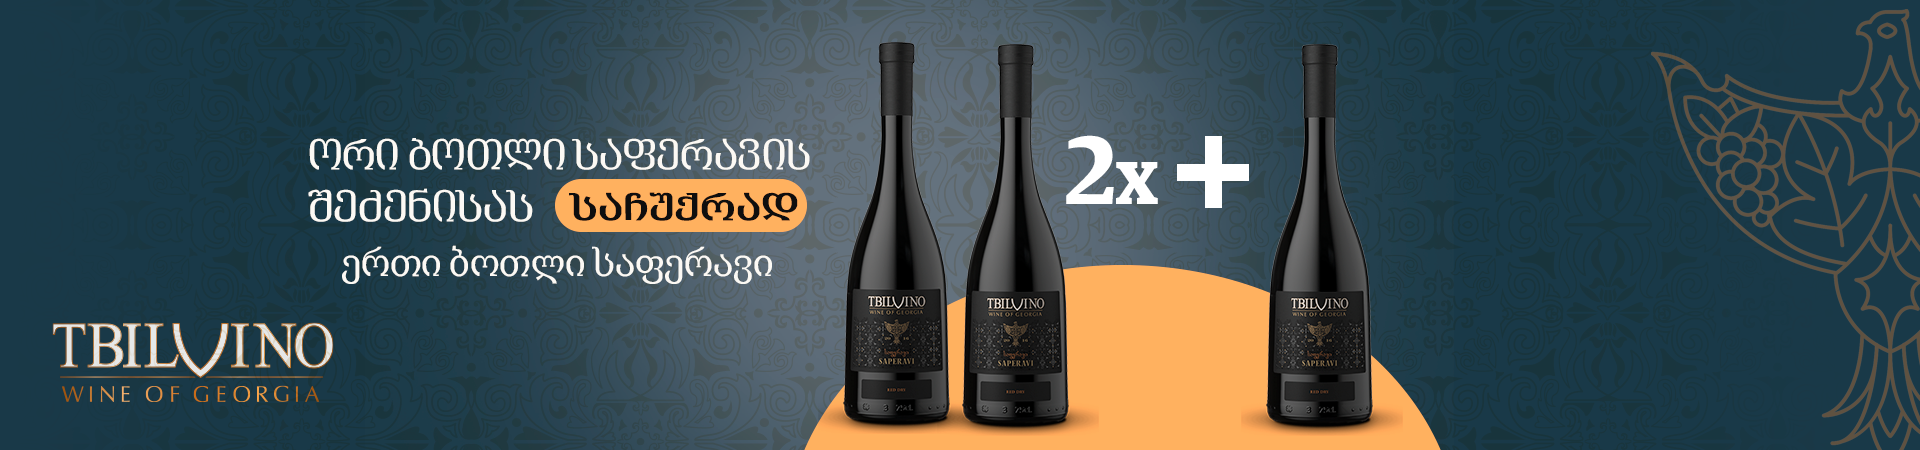 Tbilvino-Saperavi-2+1-1920X450-GEO